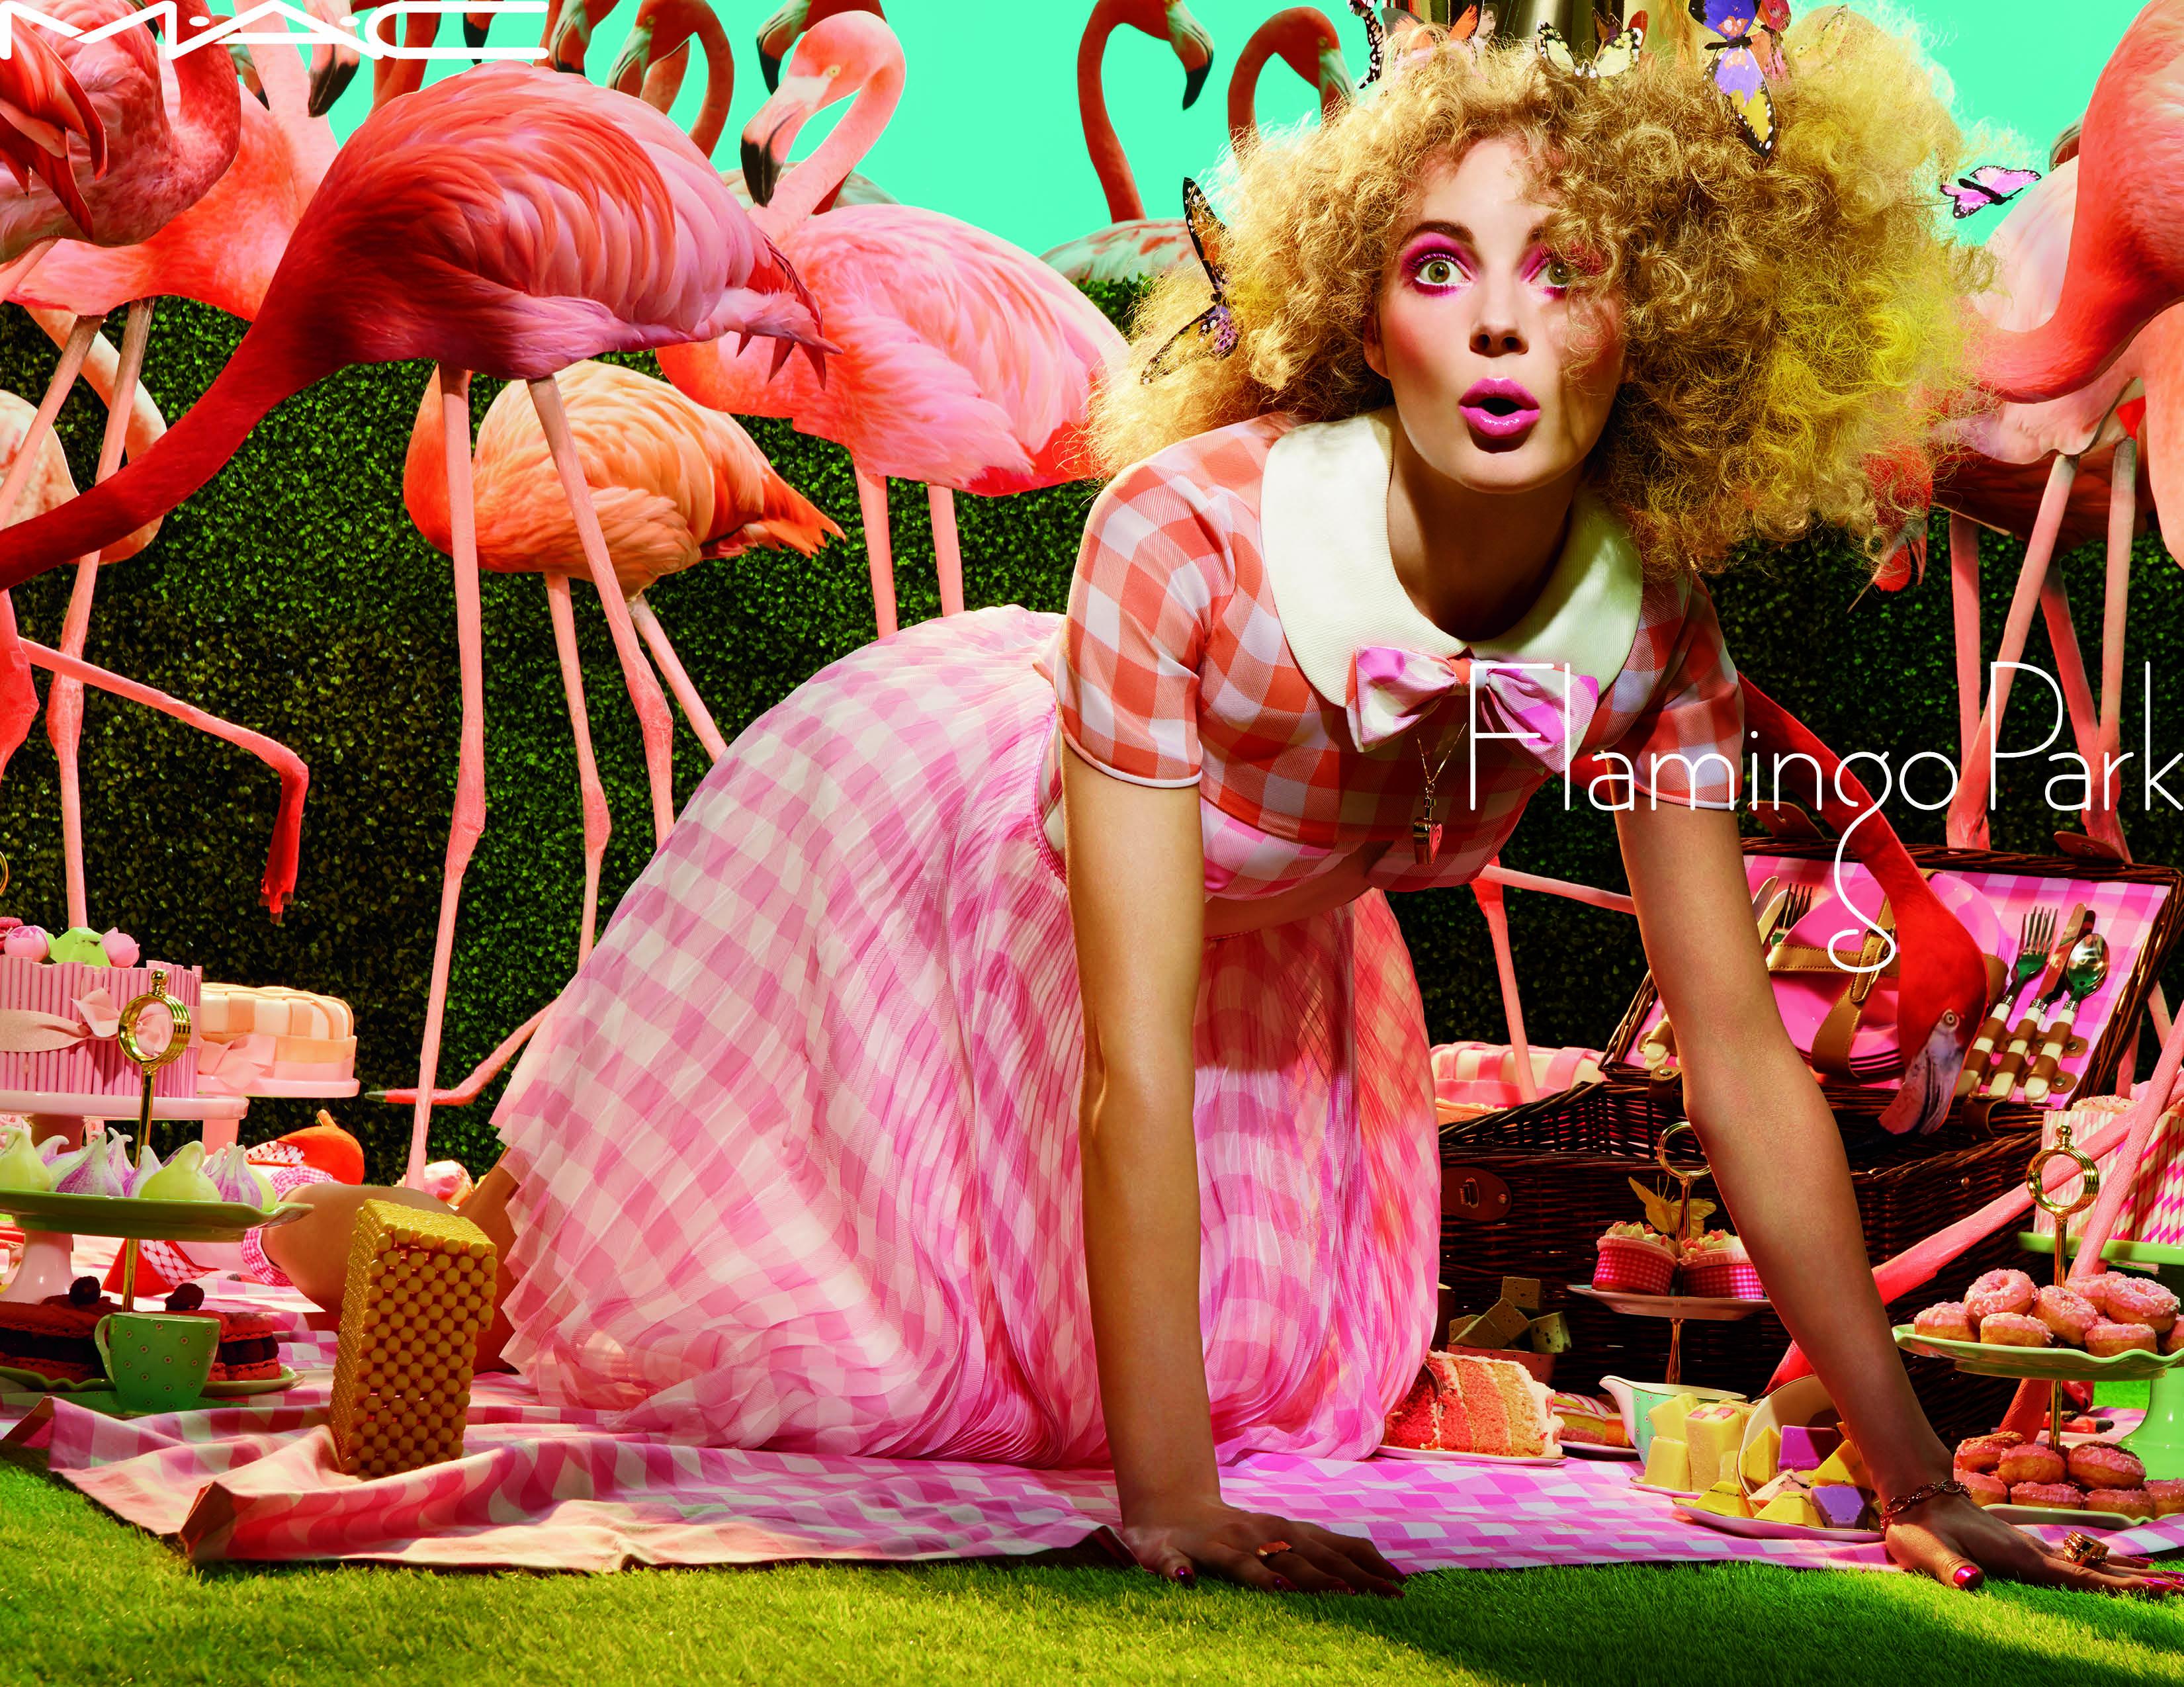 flamingo_park_beauty_300.jpg